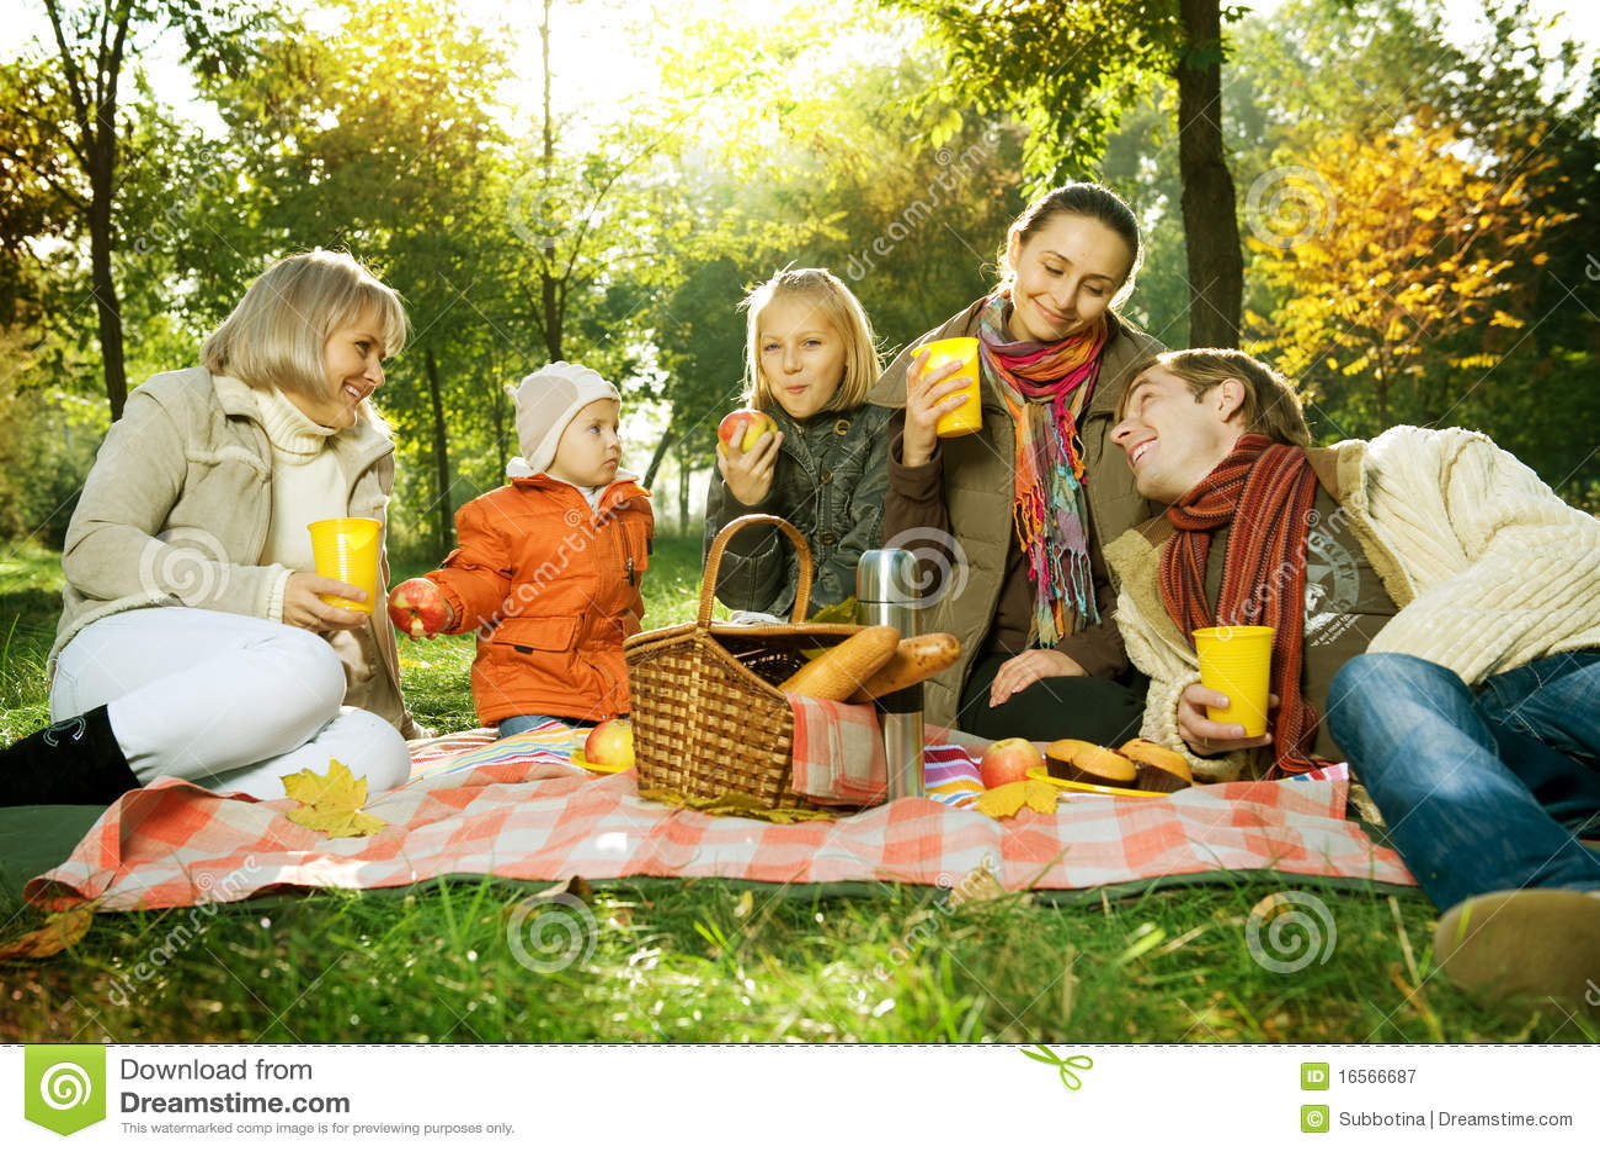 Picnic Royalty Free Stock Photography - Image: 16566687